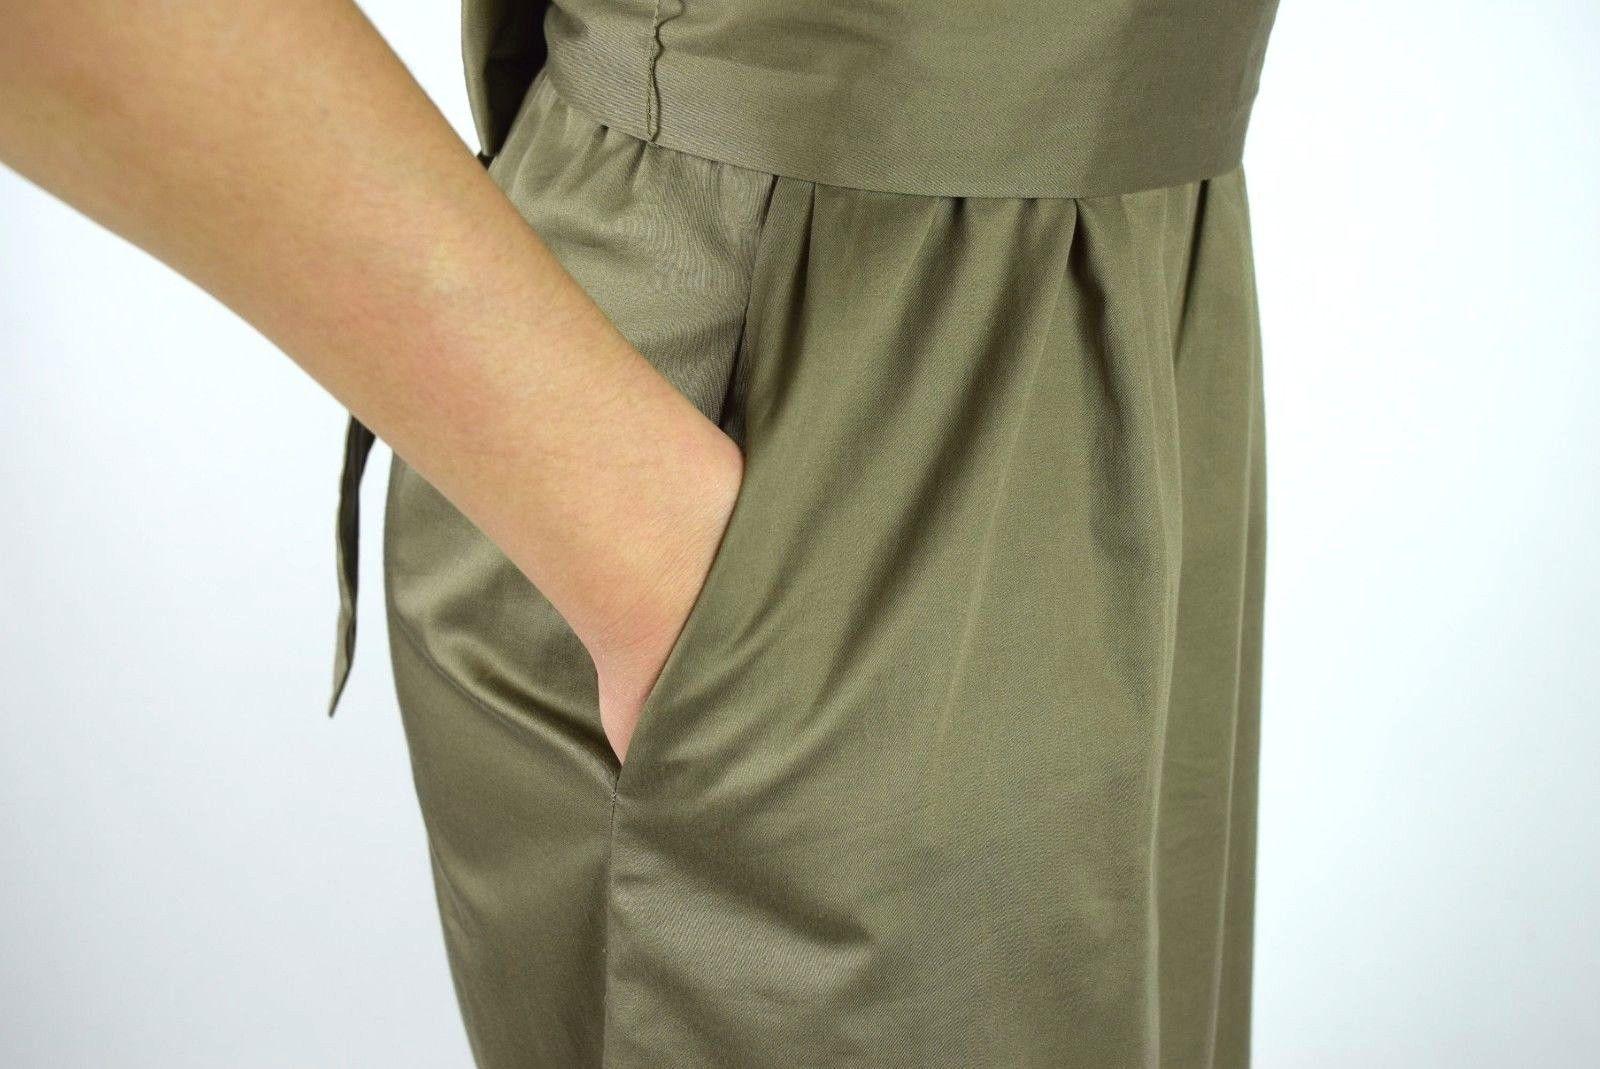 J.Crew Olive Ruffled Cotton Boat Neck Knee Length Shift Dress Sleeveless M image 8